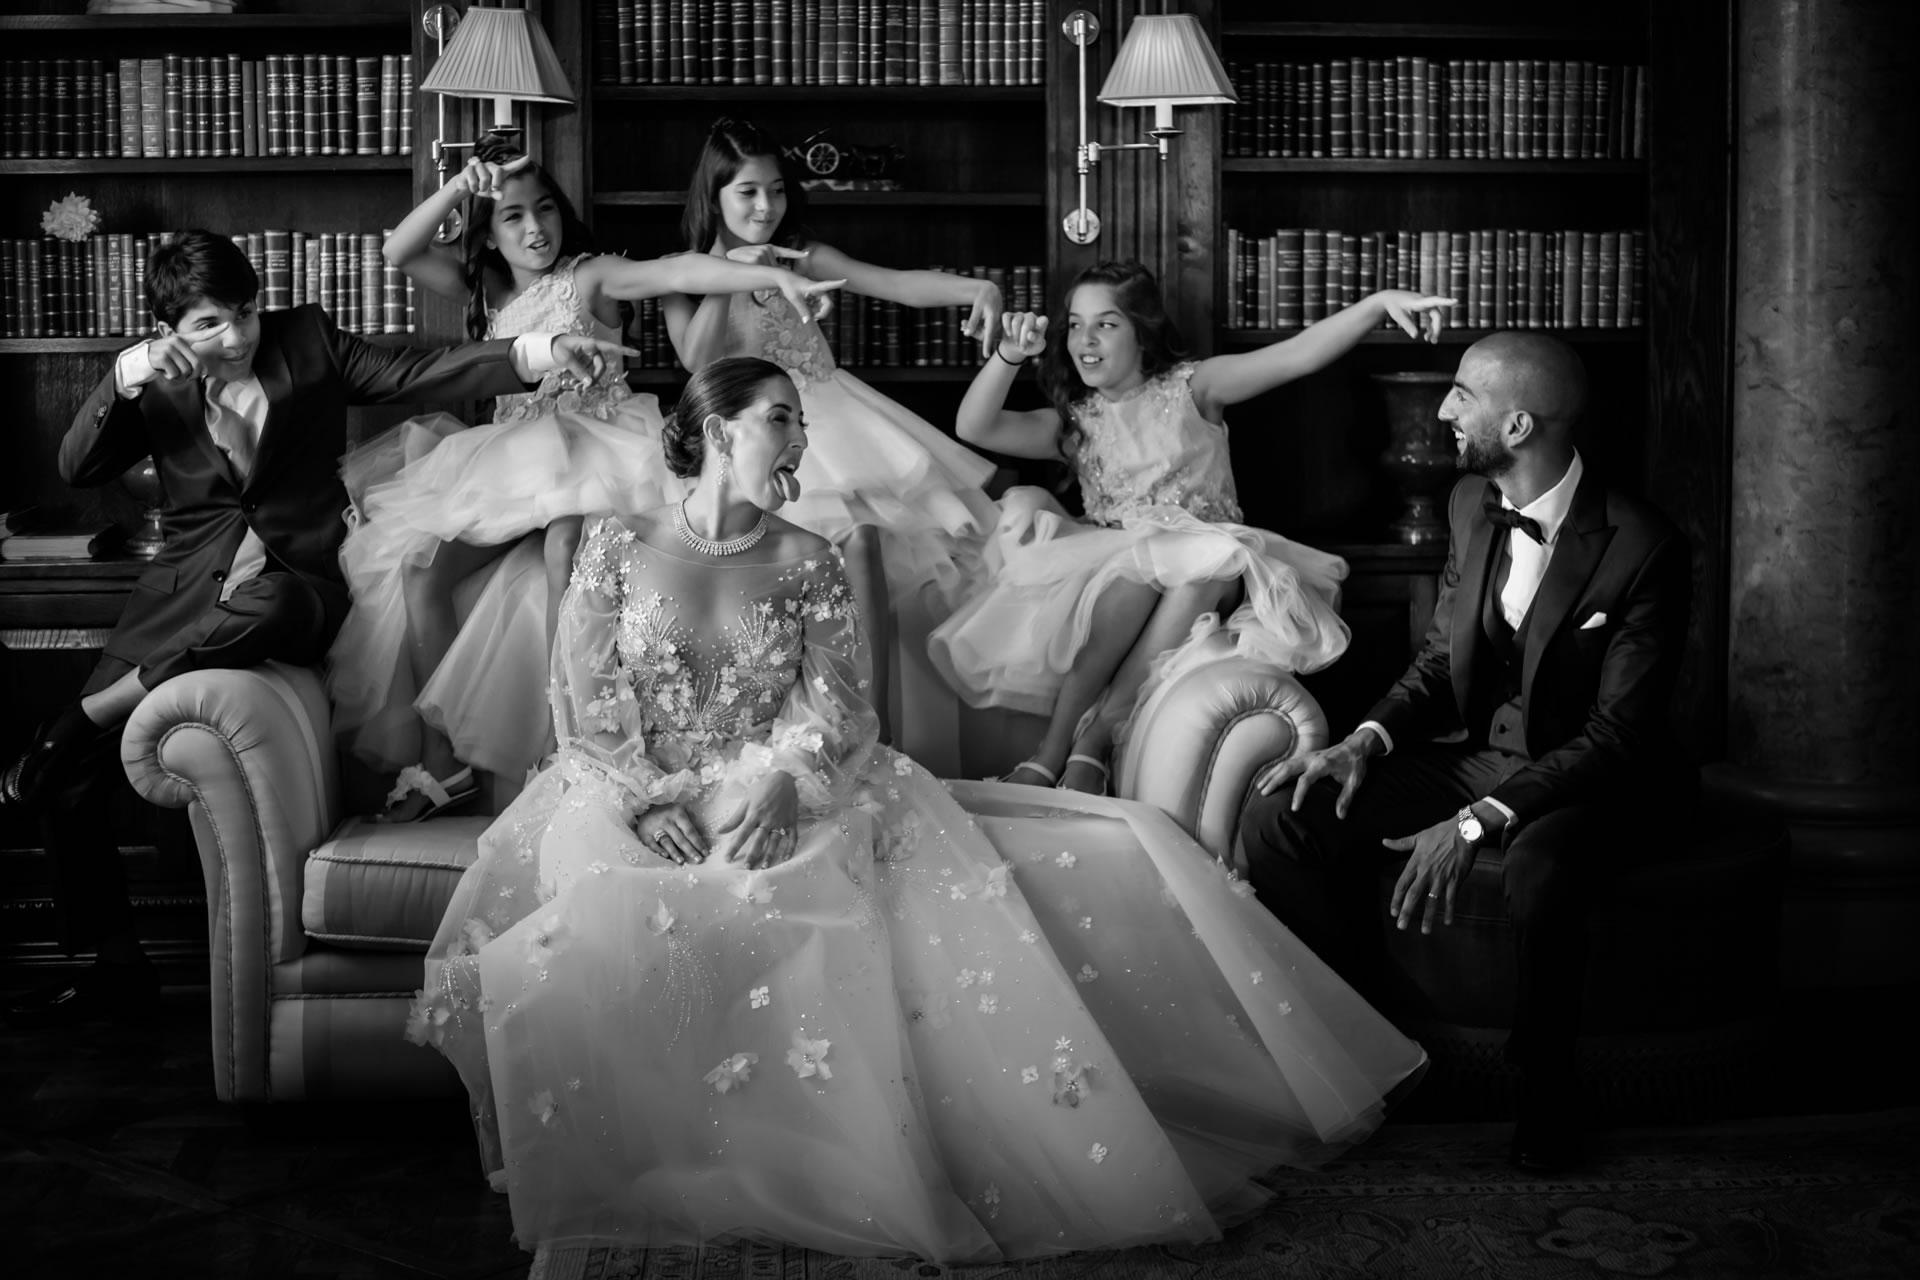 Friends - 13 :: Luxury wedding at Il Borro :: Luxury wedding photography - 12 :: Friends - 13